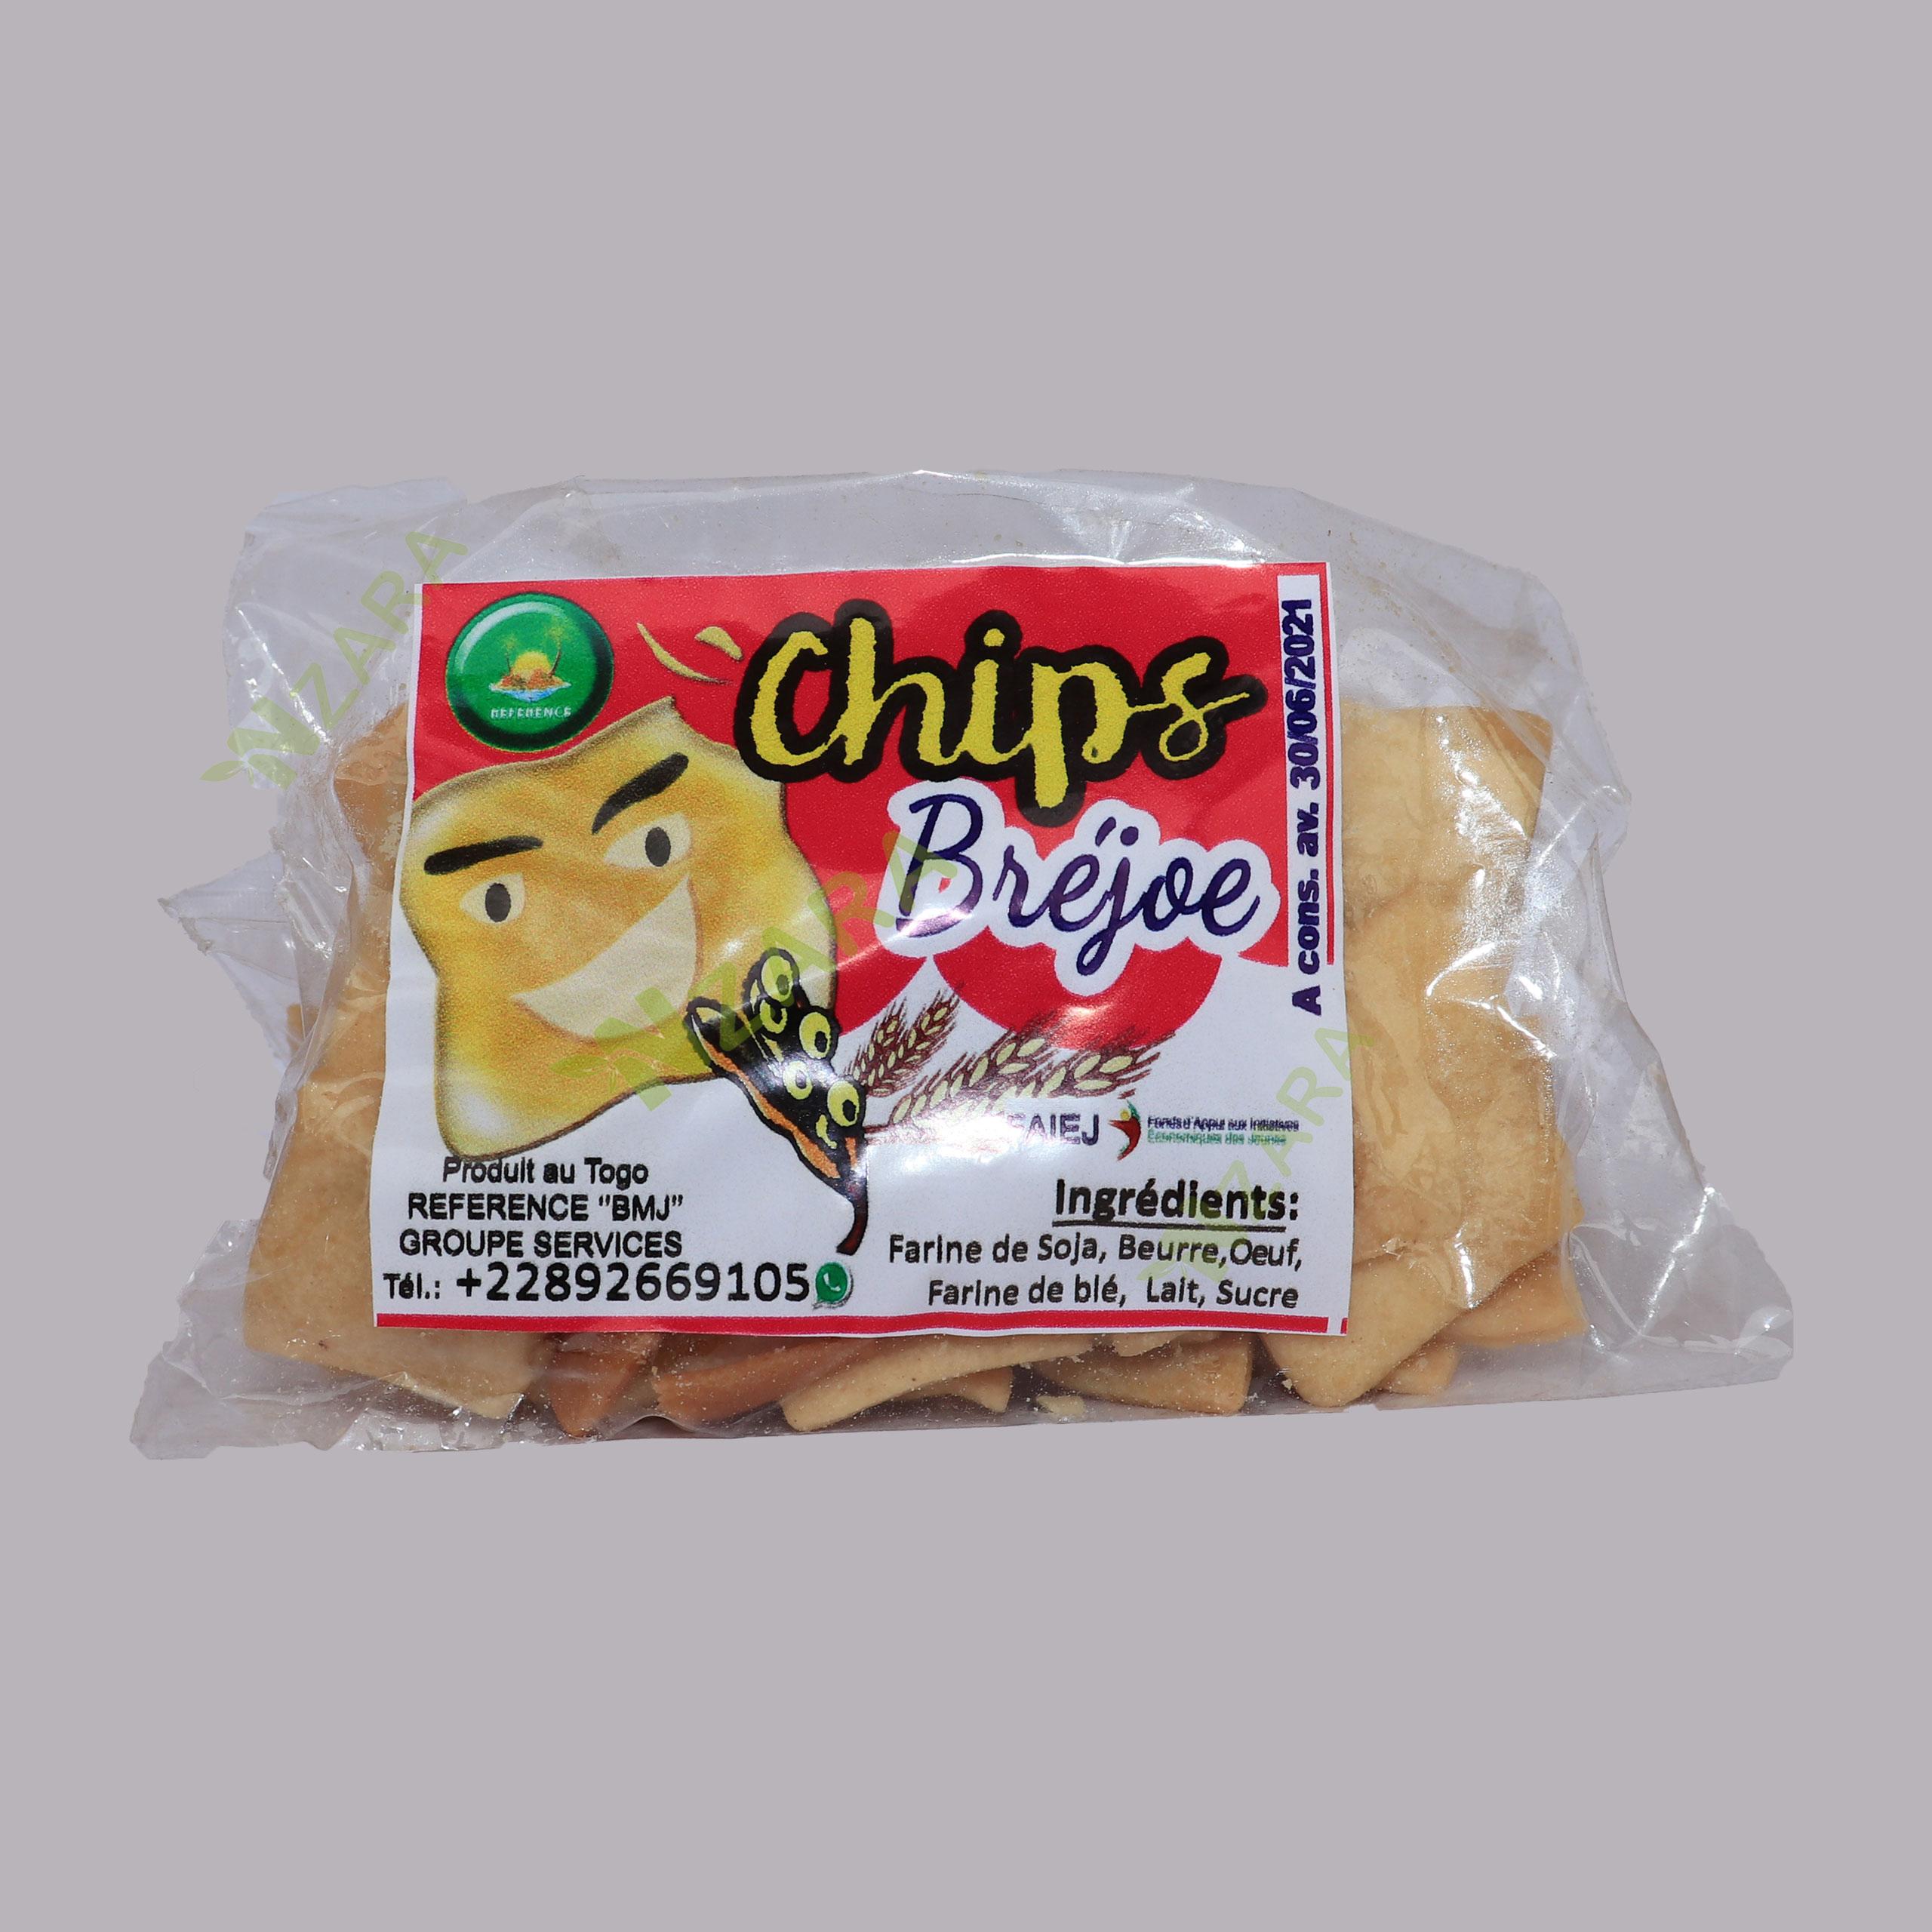 Chips bréjoe